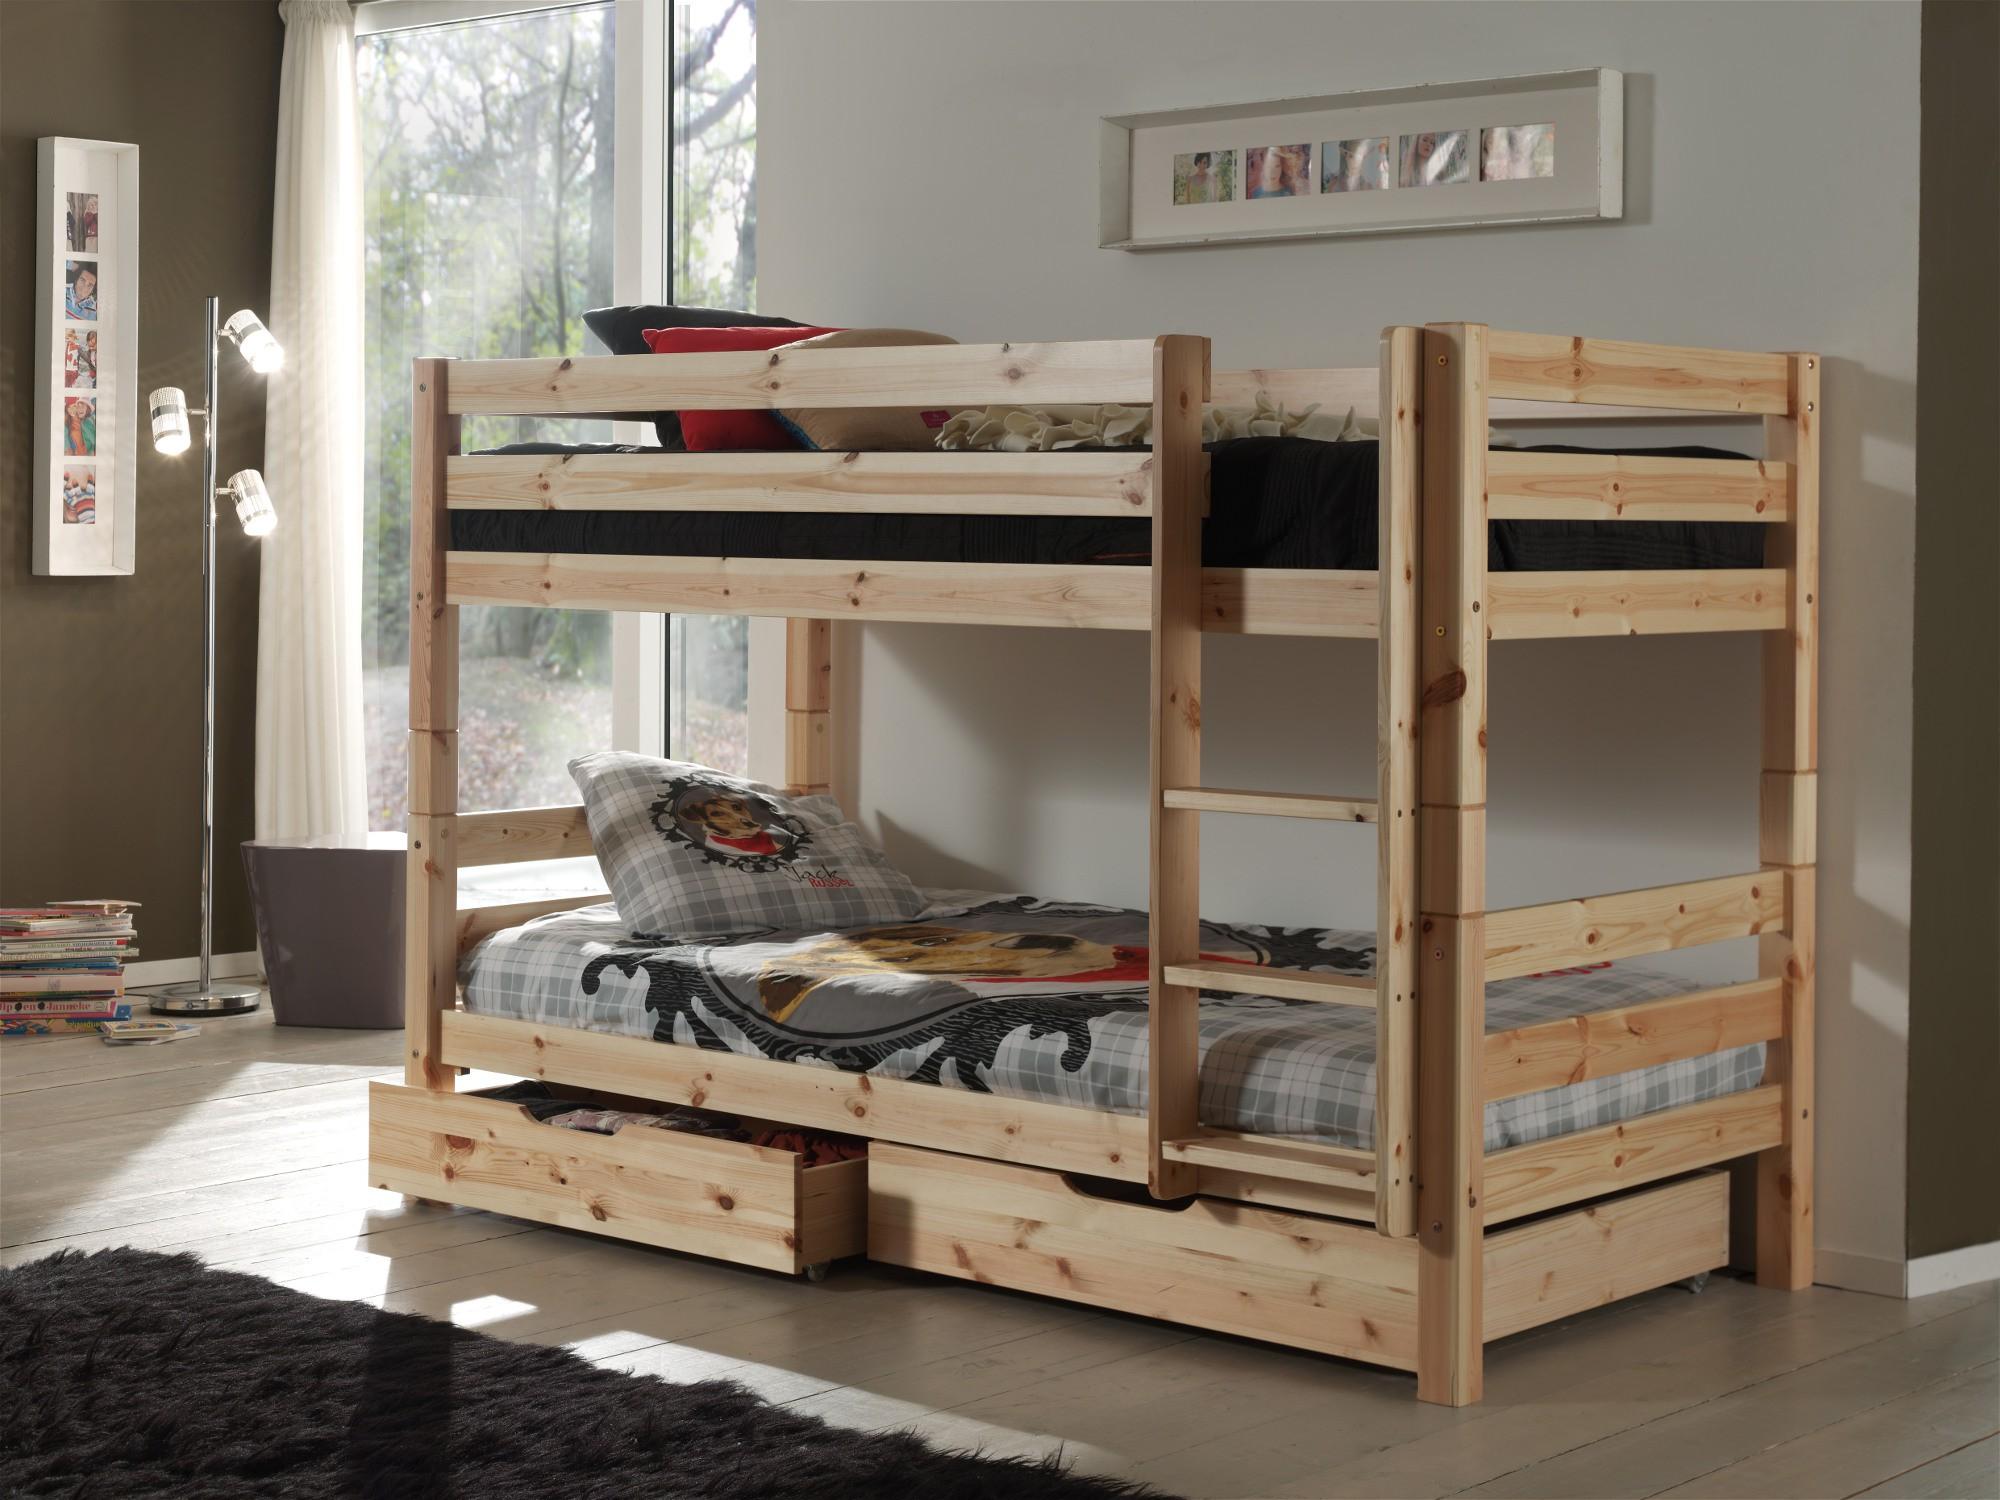 neu etagenbett pino doppelstockbett mit 2 bettschubladen 90 x 200 cm kiefer ebay. Black Bedroom Furniture Sets. Home Design Ideas